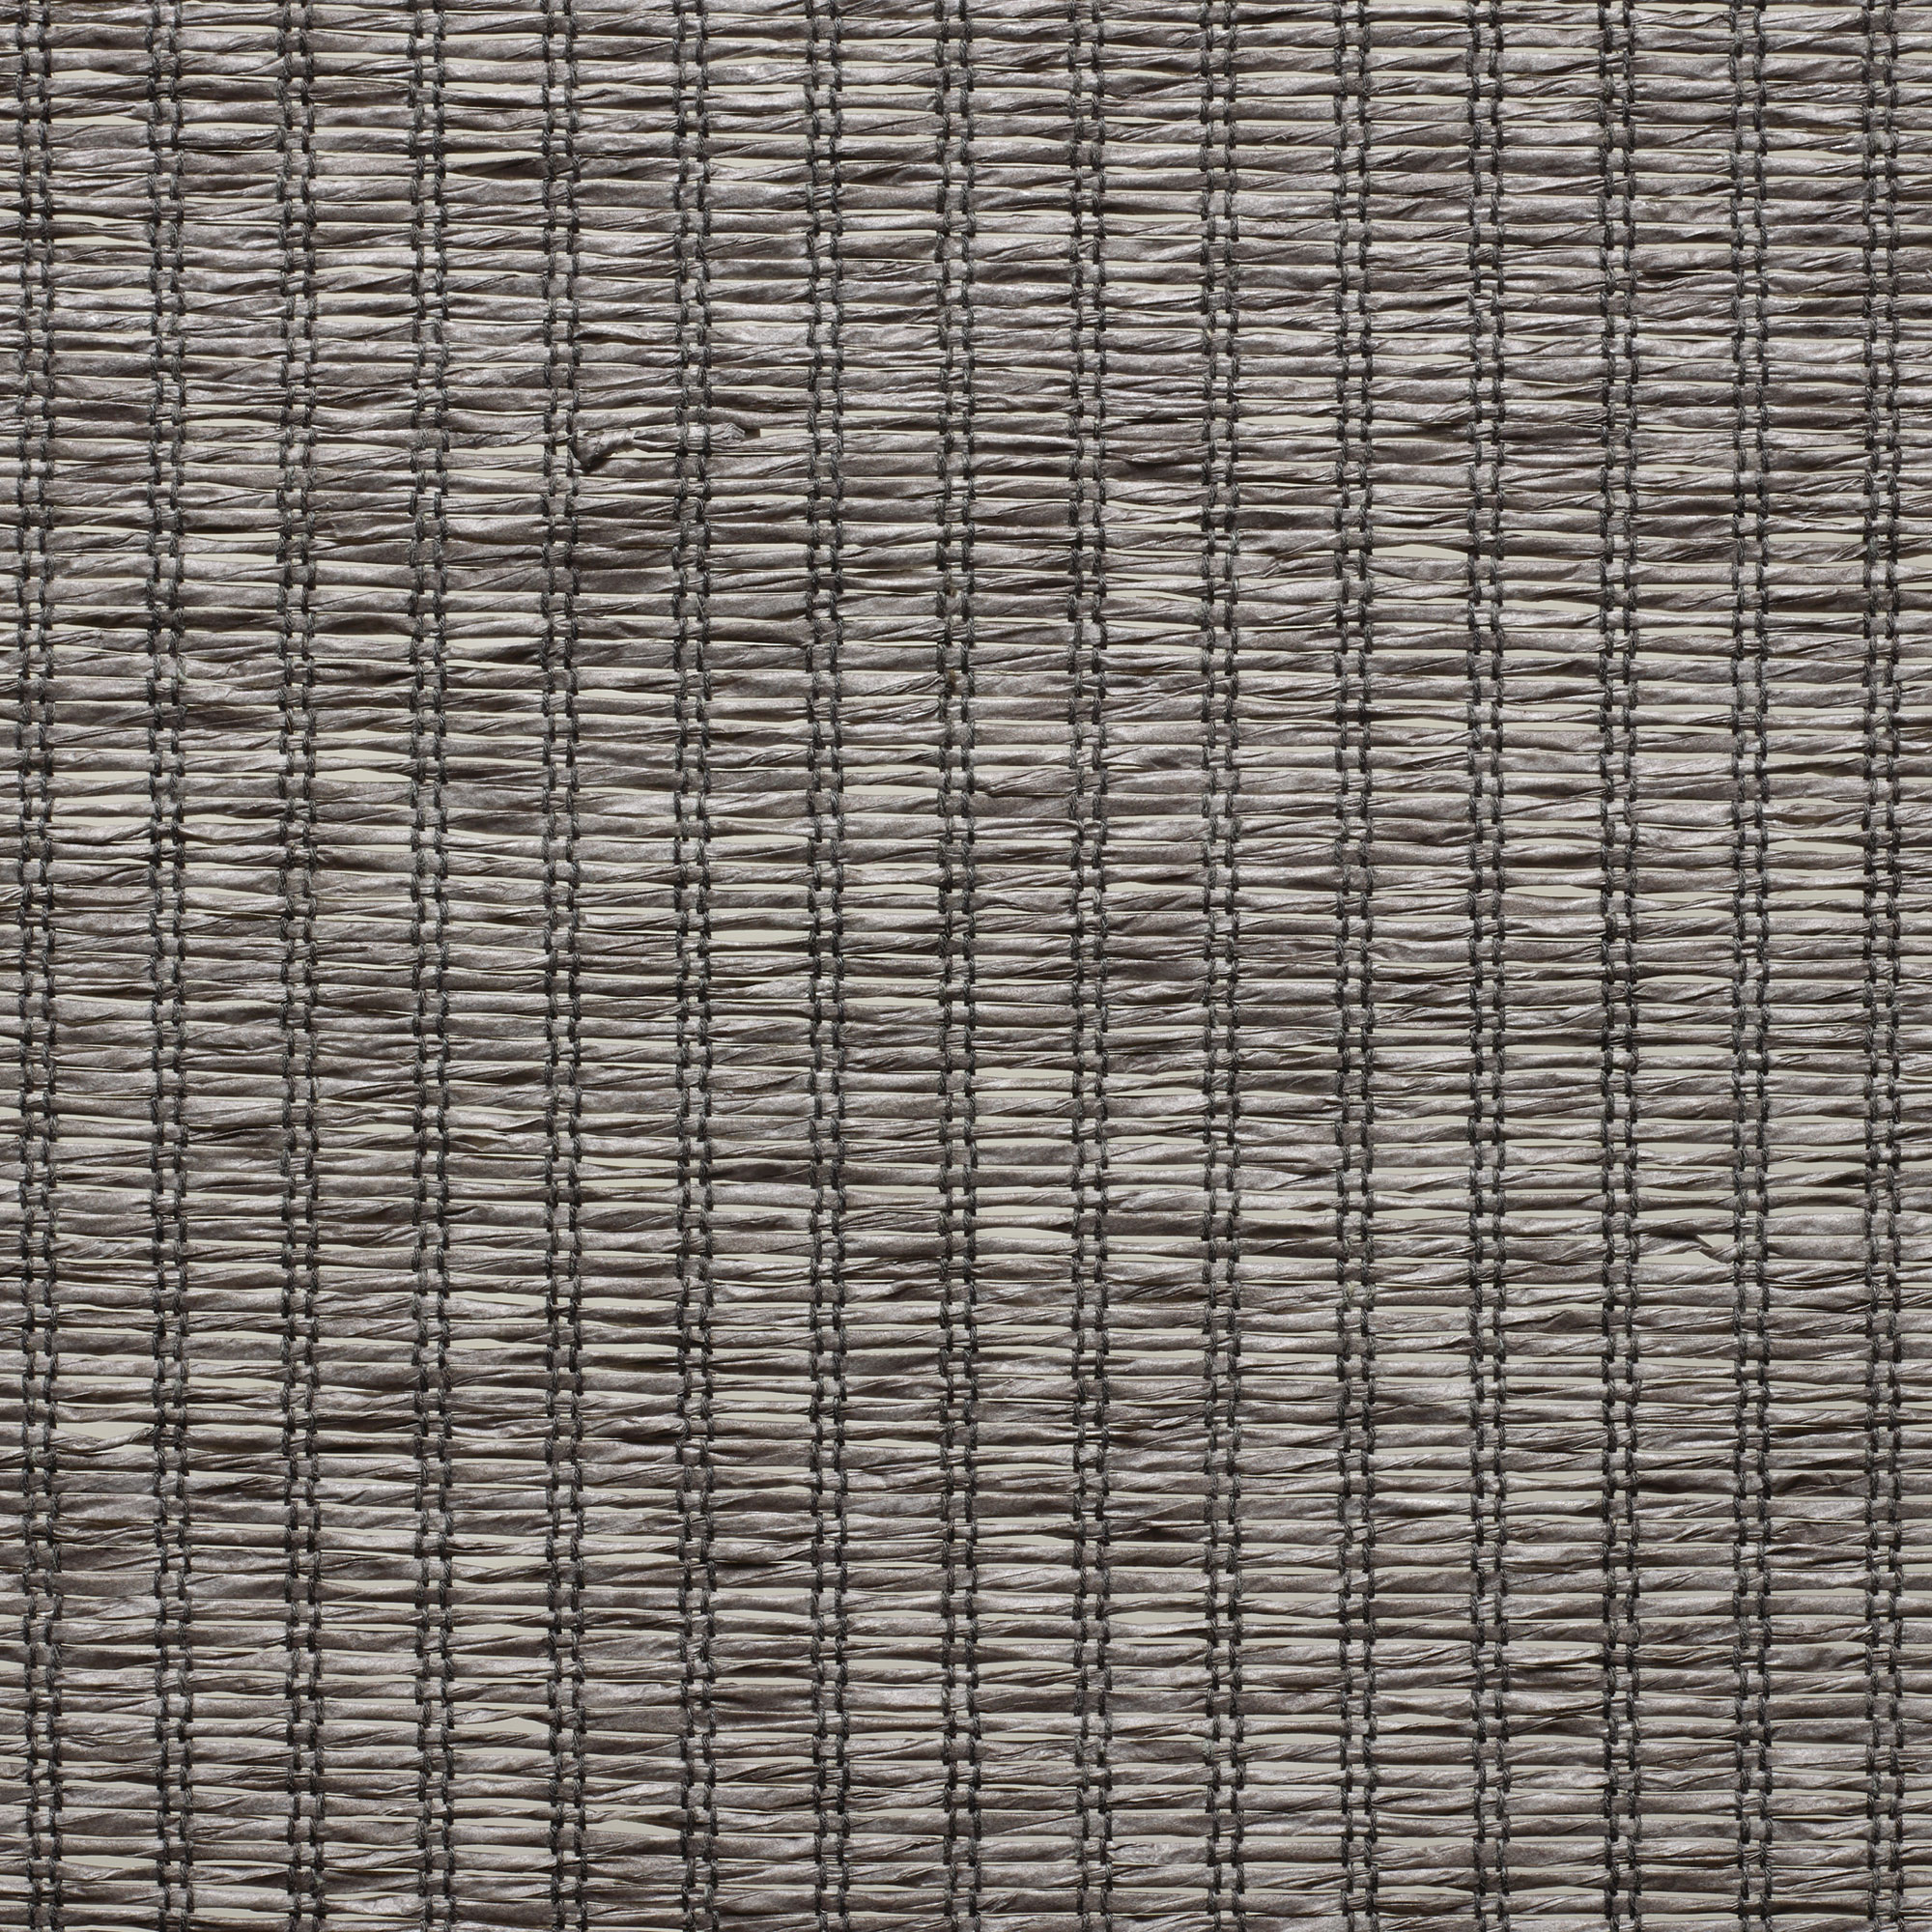 swatch-PE604-60-enlightenment-vibrant-grey-web.jpg